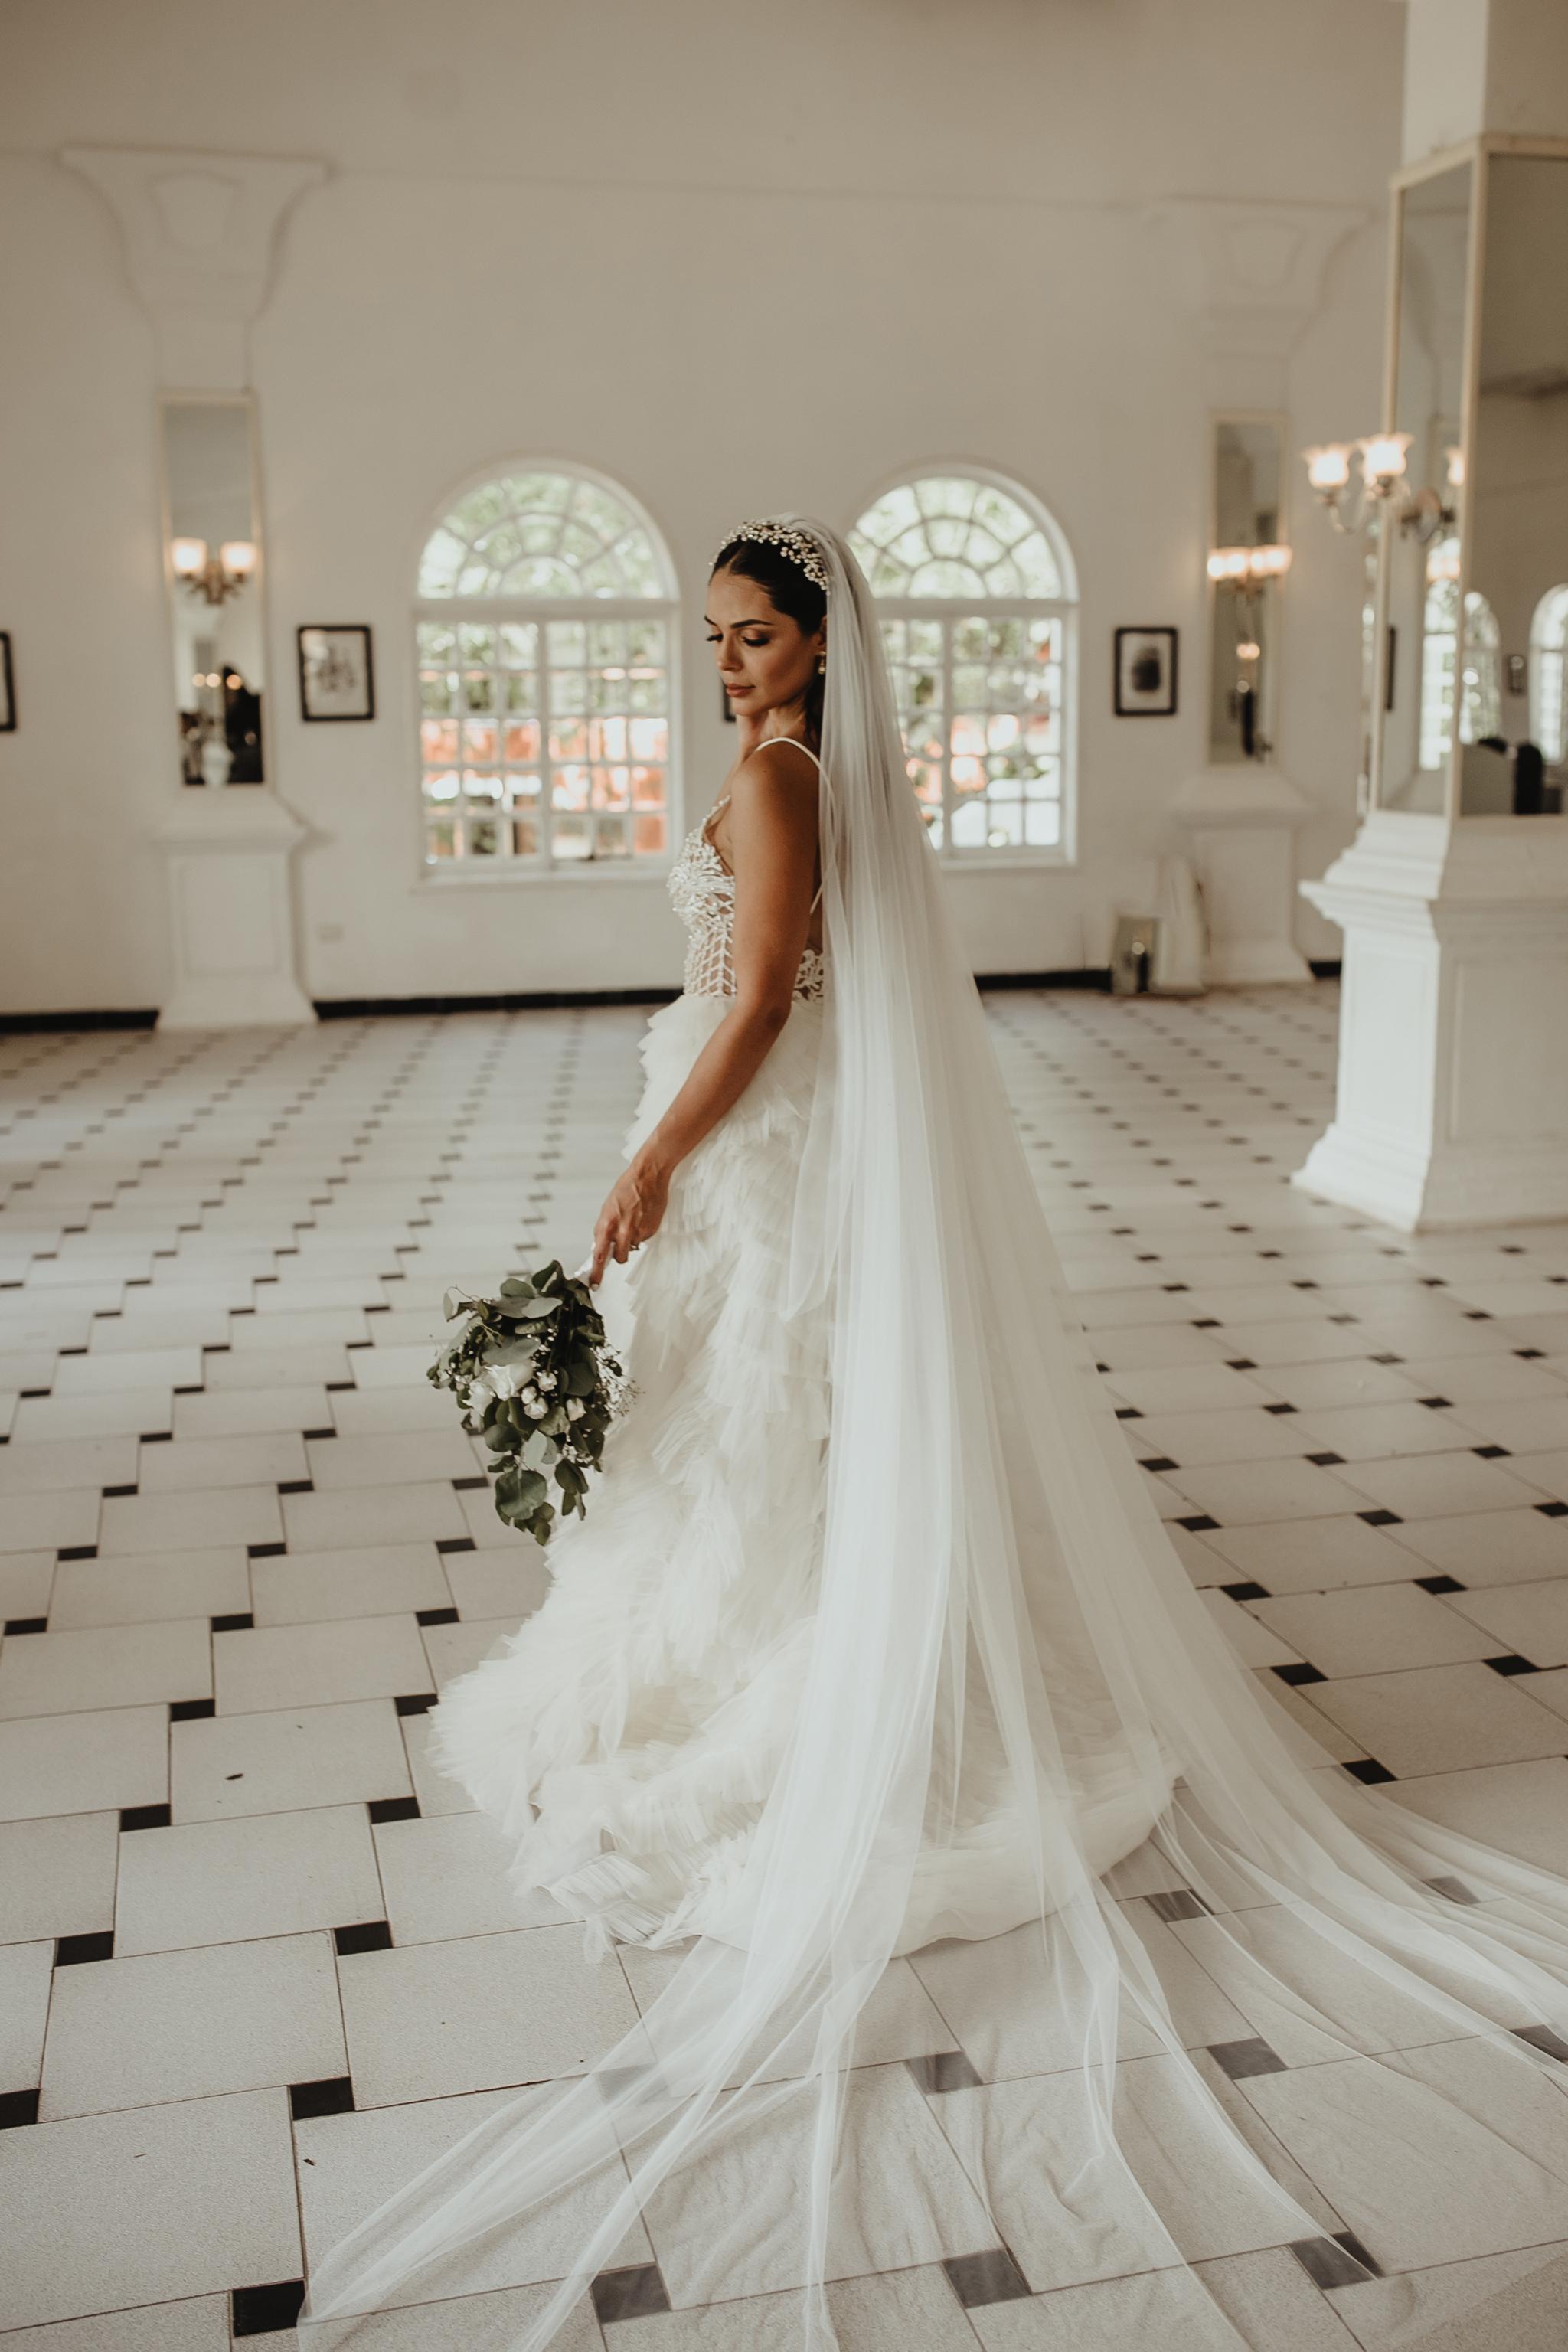 0368R&F__WeddingDestination_Weddingmerida_BodaMexico_FotografoDeBodas_FabrizioSimoneenFotografo.jpg